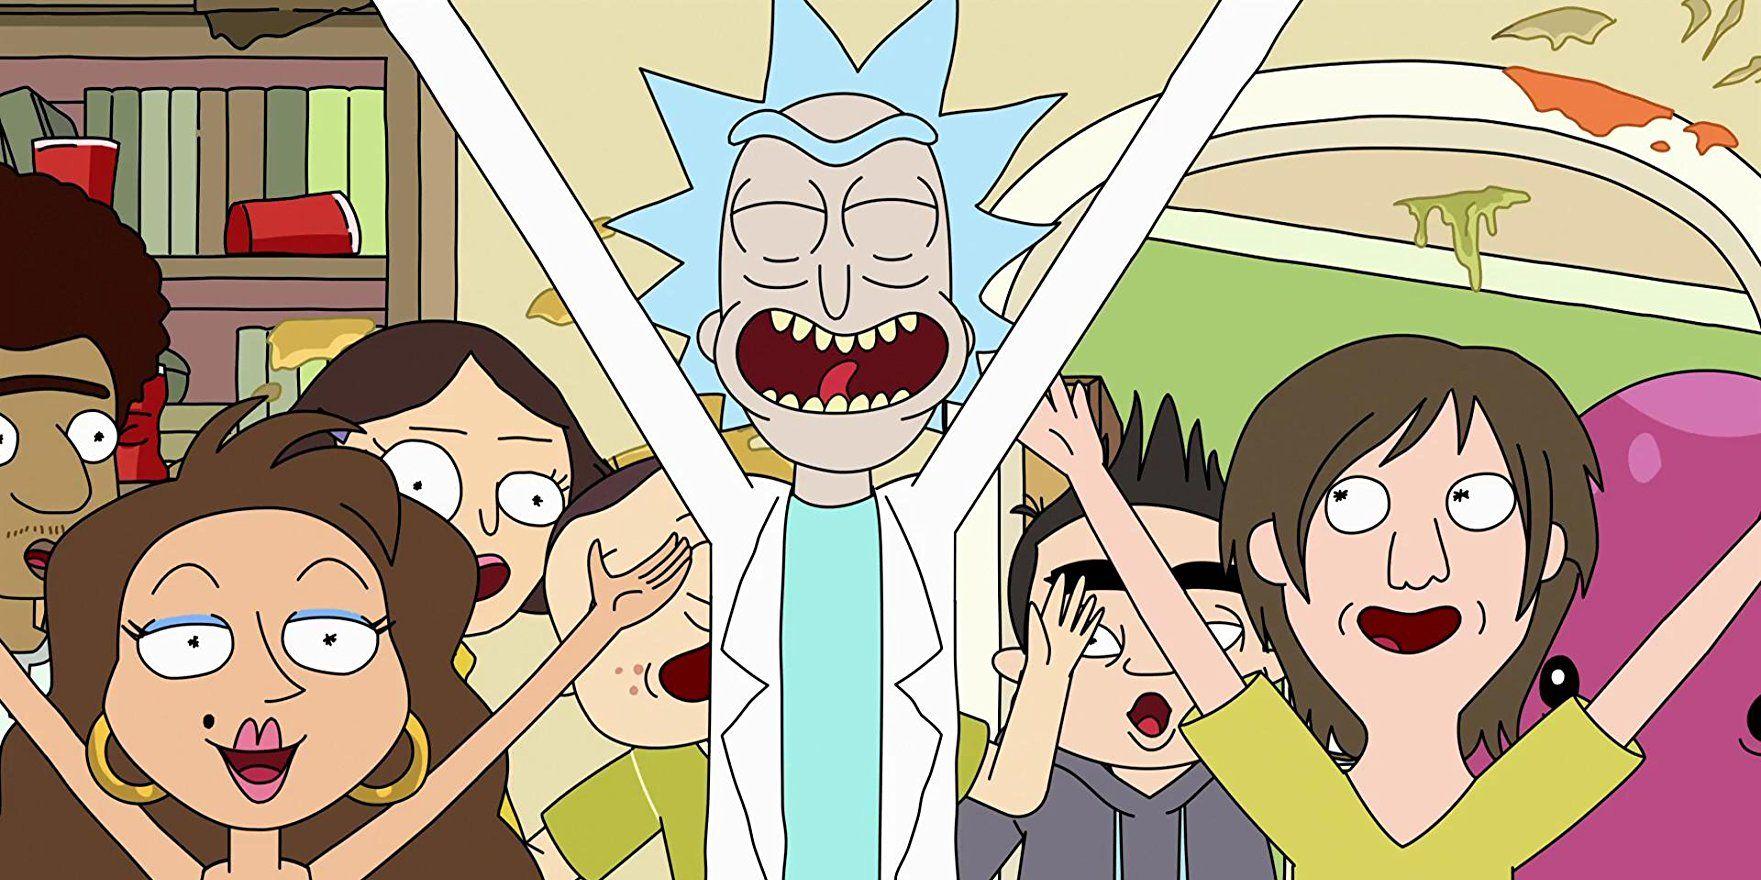 Rick and Morty, 'Ricksky Business'